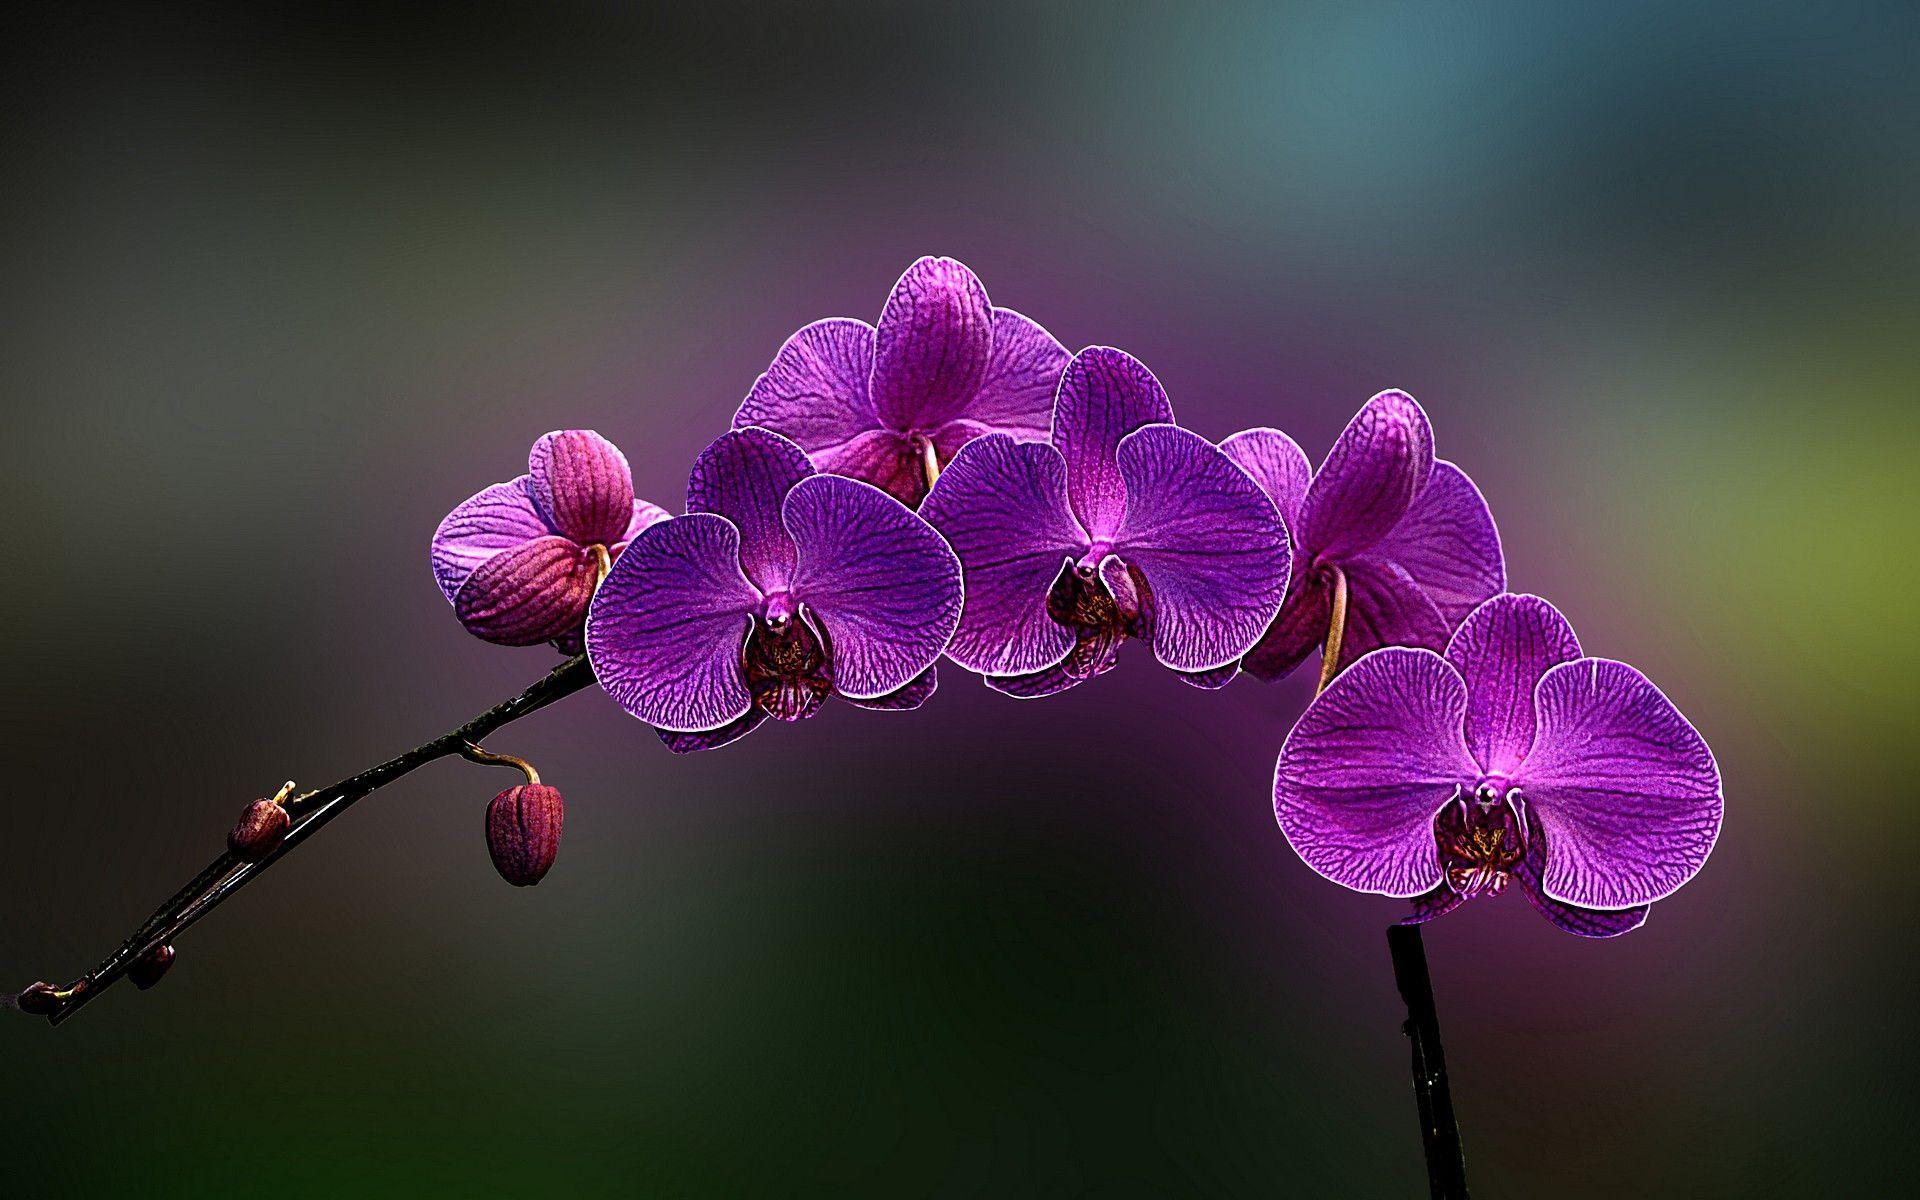 Habrumalas orchids in water wallpaper images - Orchid Wallpapers Full Hd Wallpaper Search Vir G Orchidea 6017177744410156b1fd4e0143a9facf